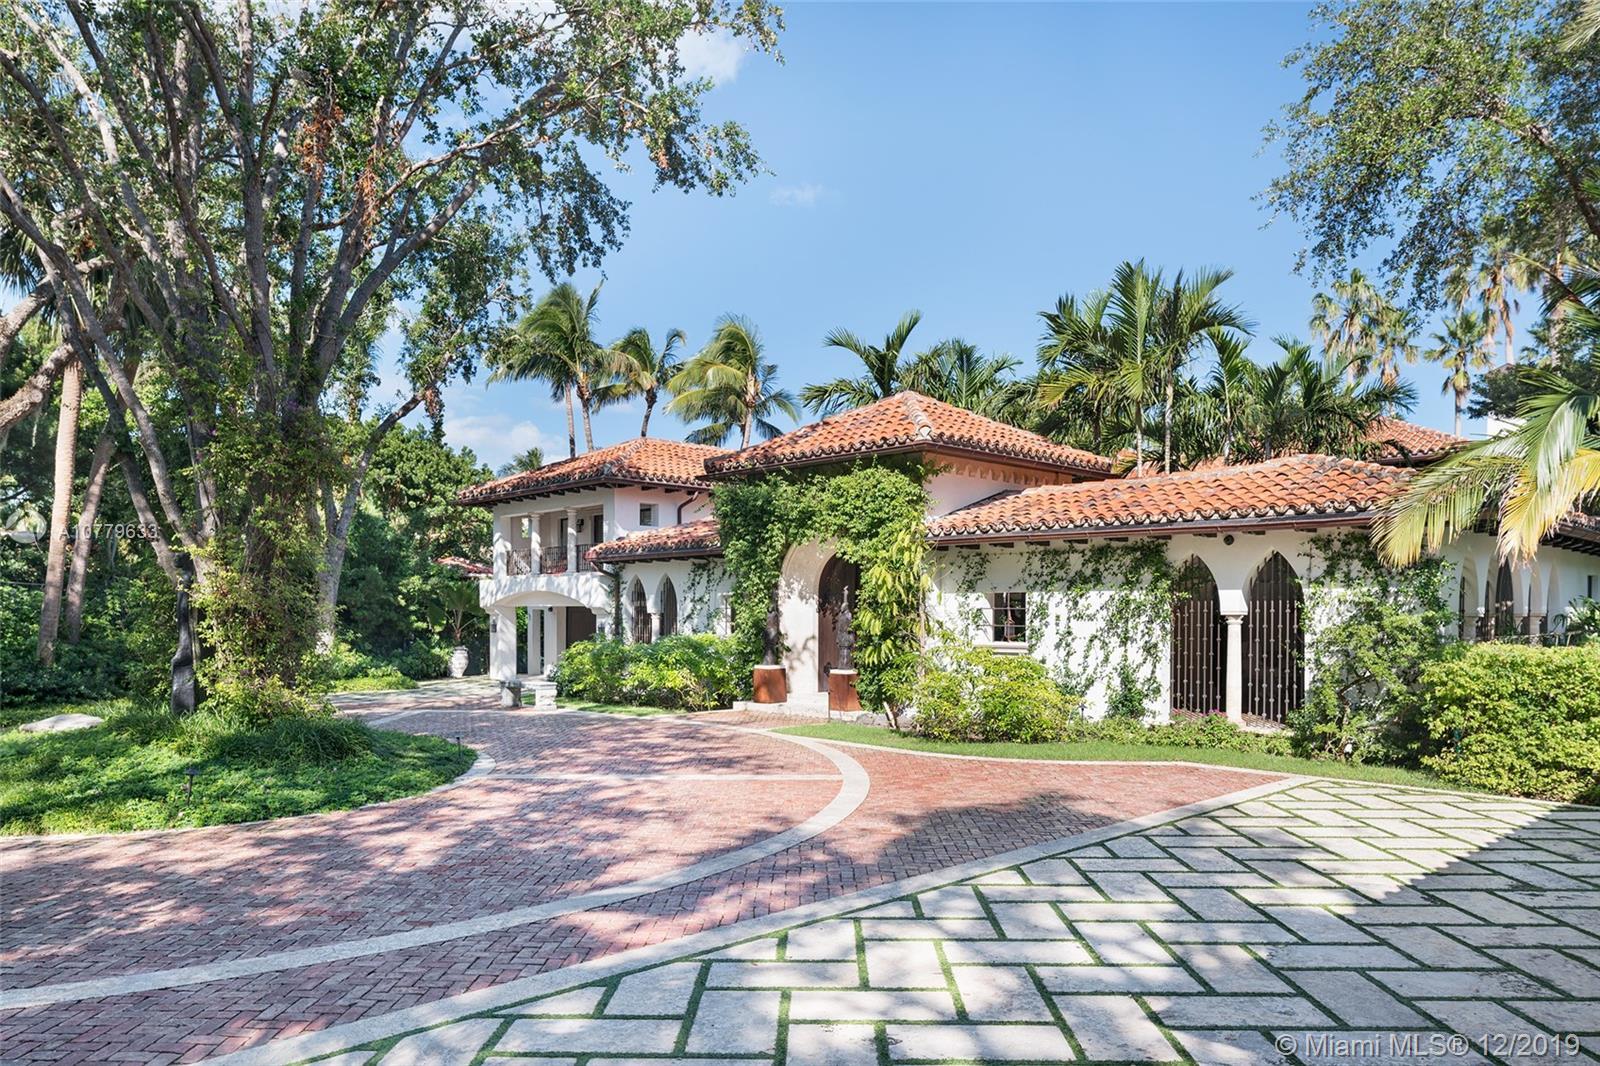 6385 Pinetree Drive Cir - Miami Beach, Florida